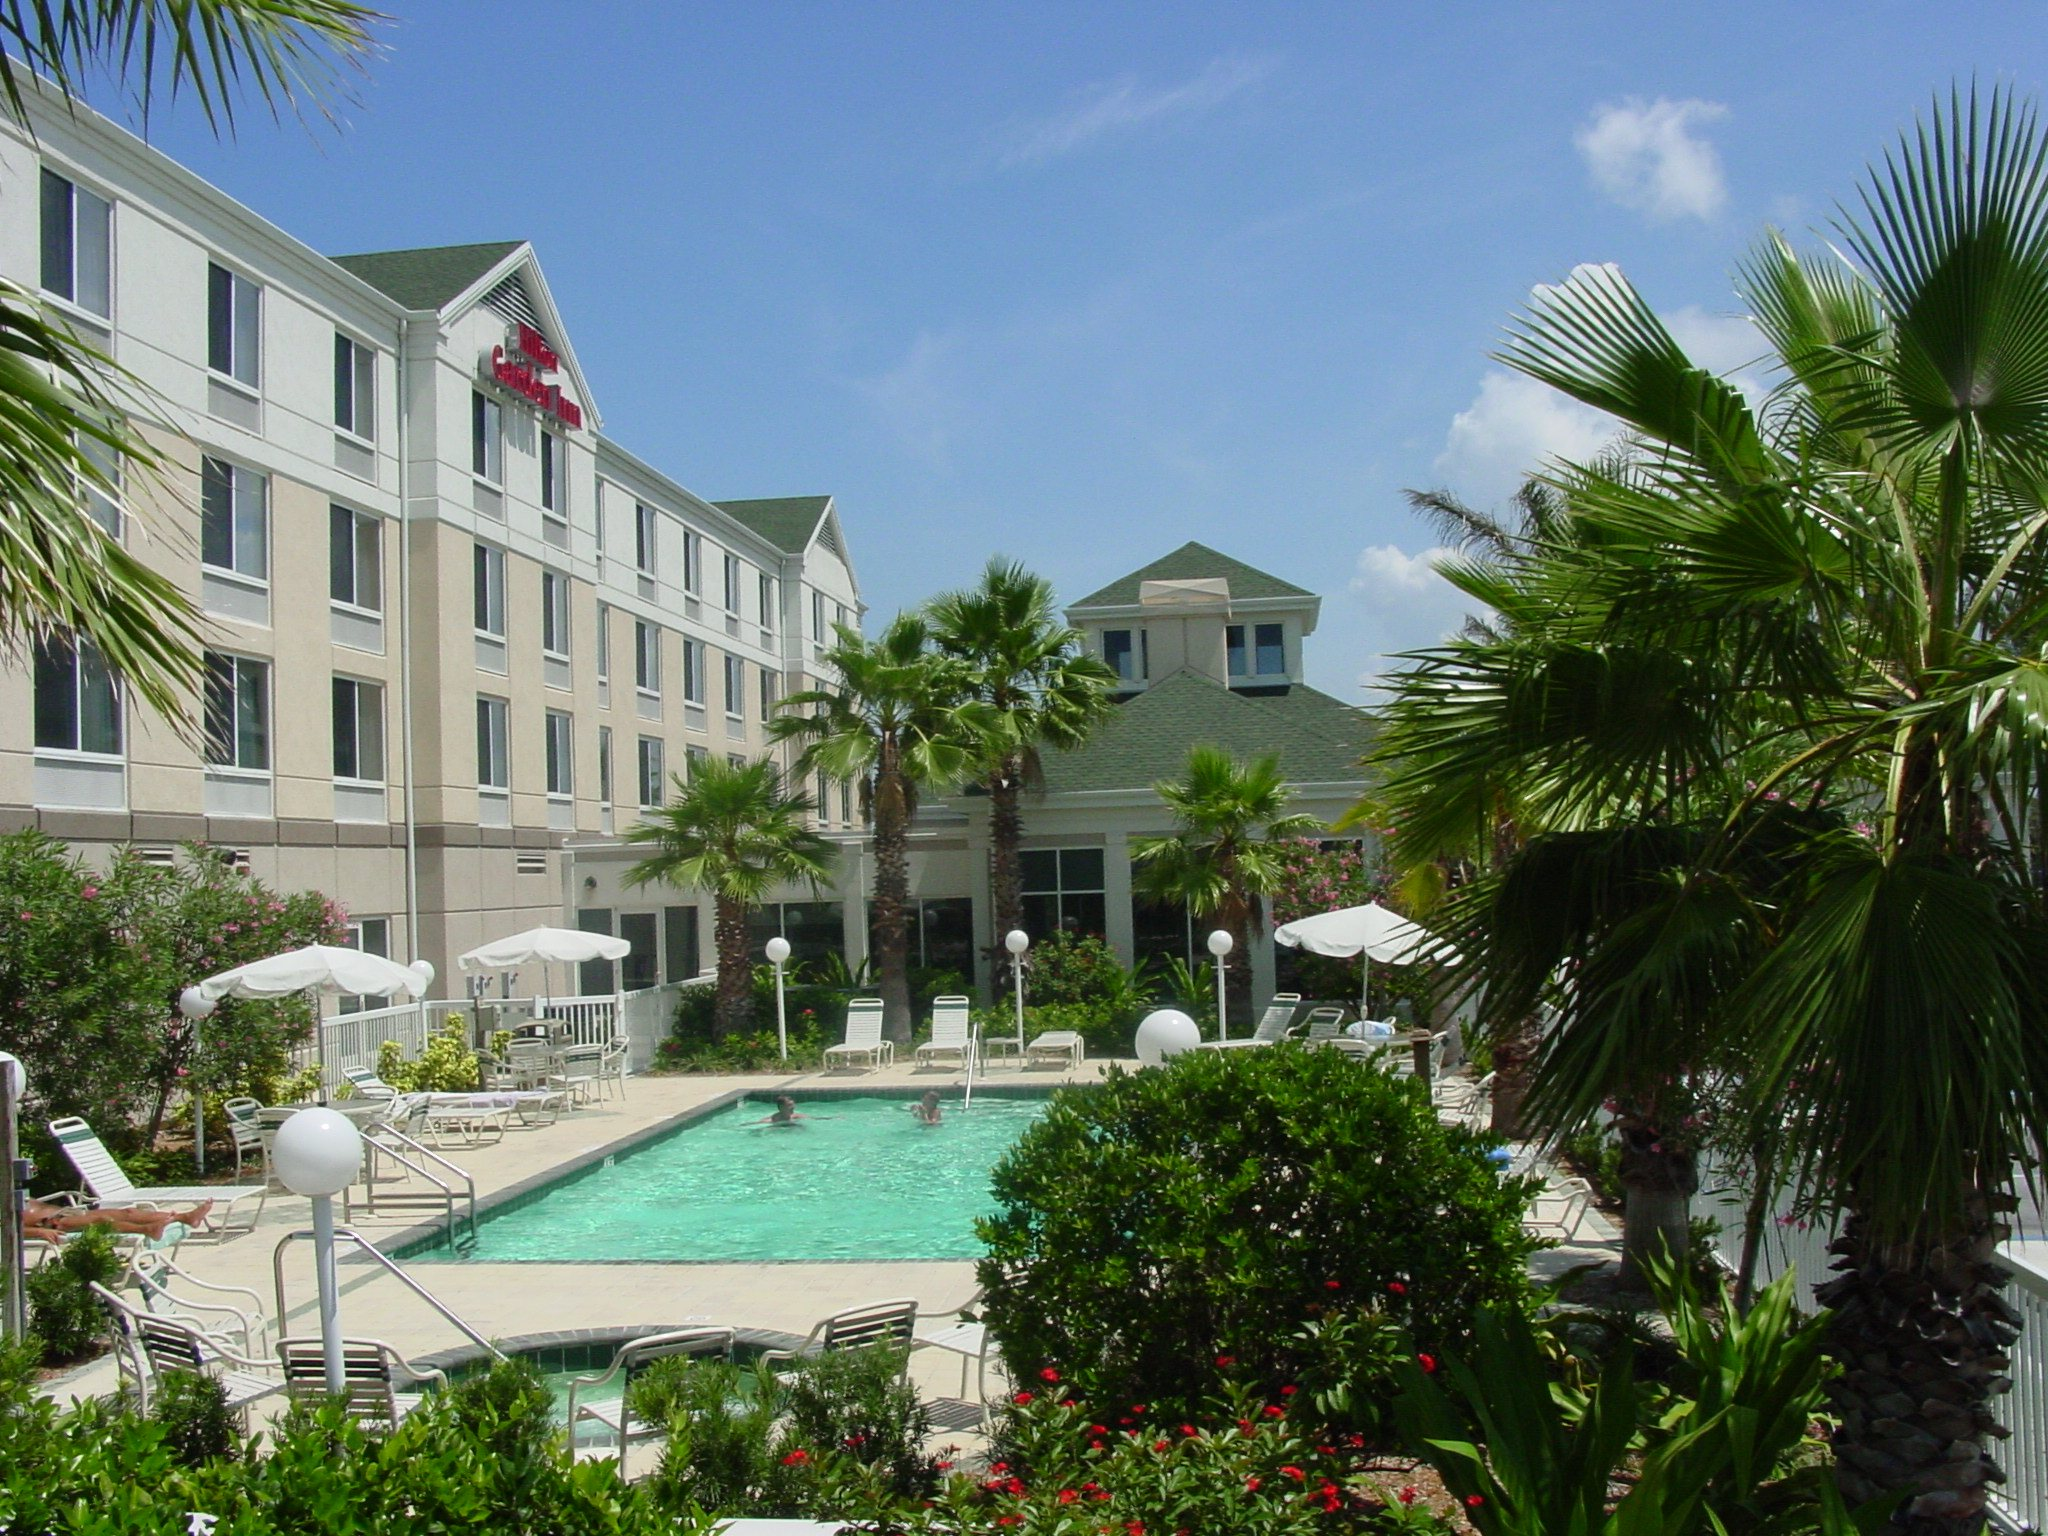 File:Hilton Garden Inn Sarasota.jpg - Wikipedia